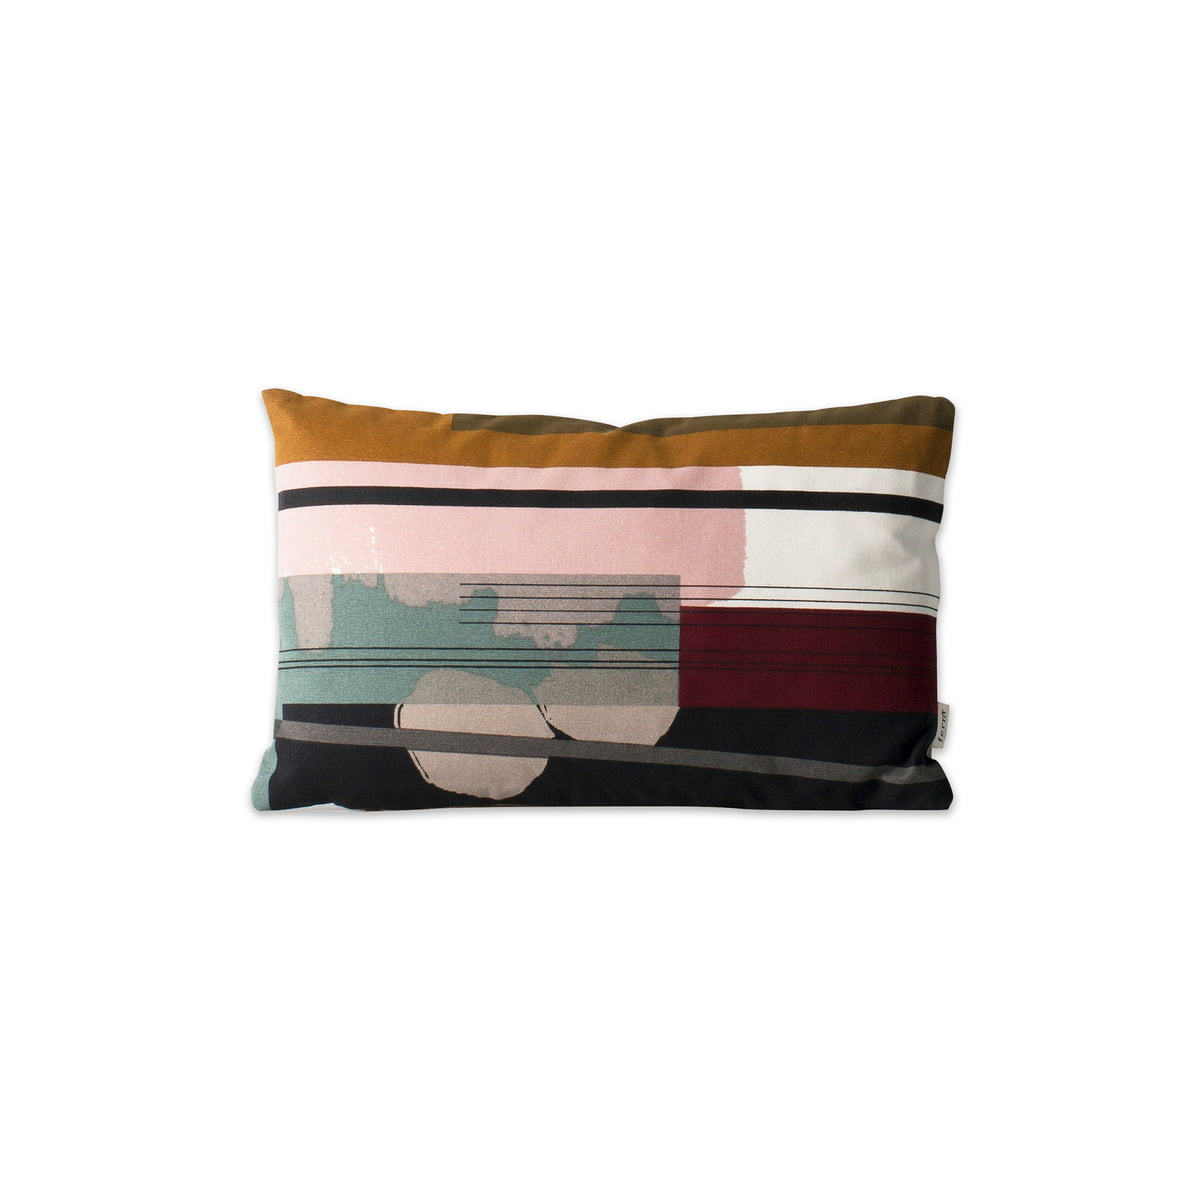 Colour Block Cushion Small 3 By Ferm Living